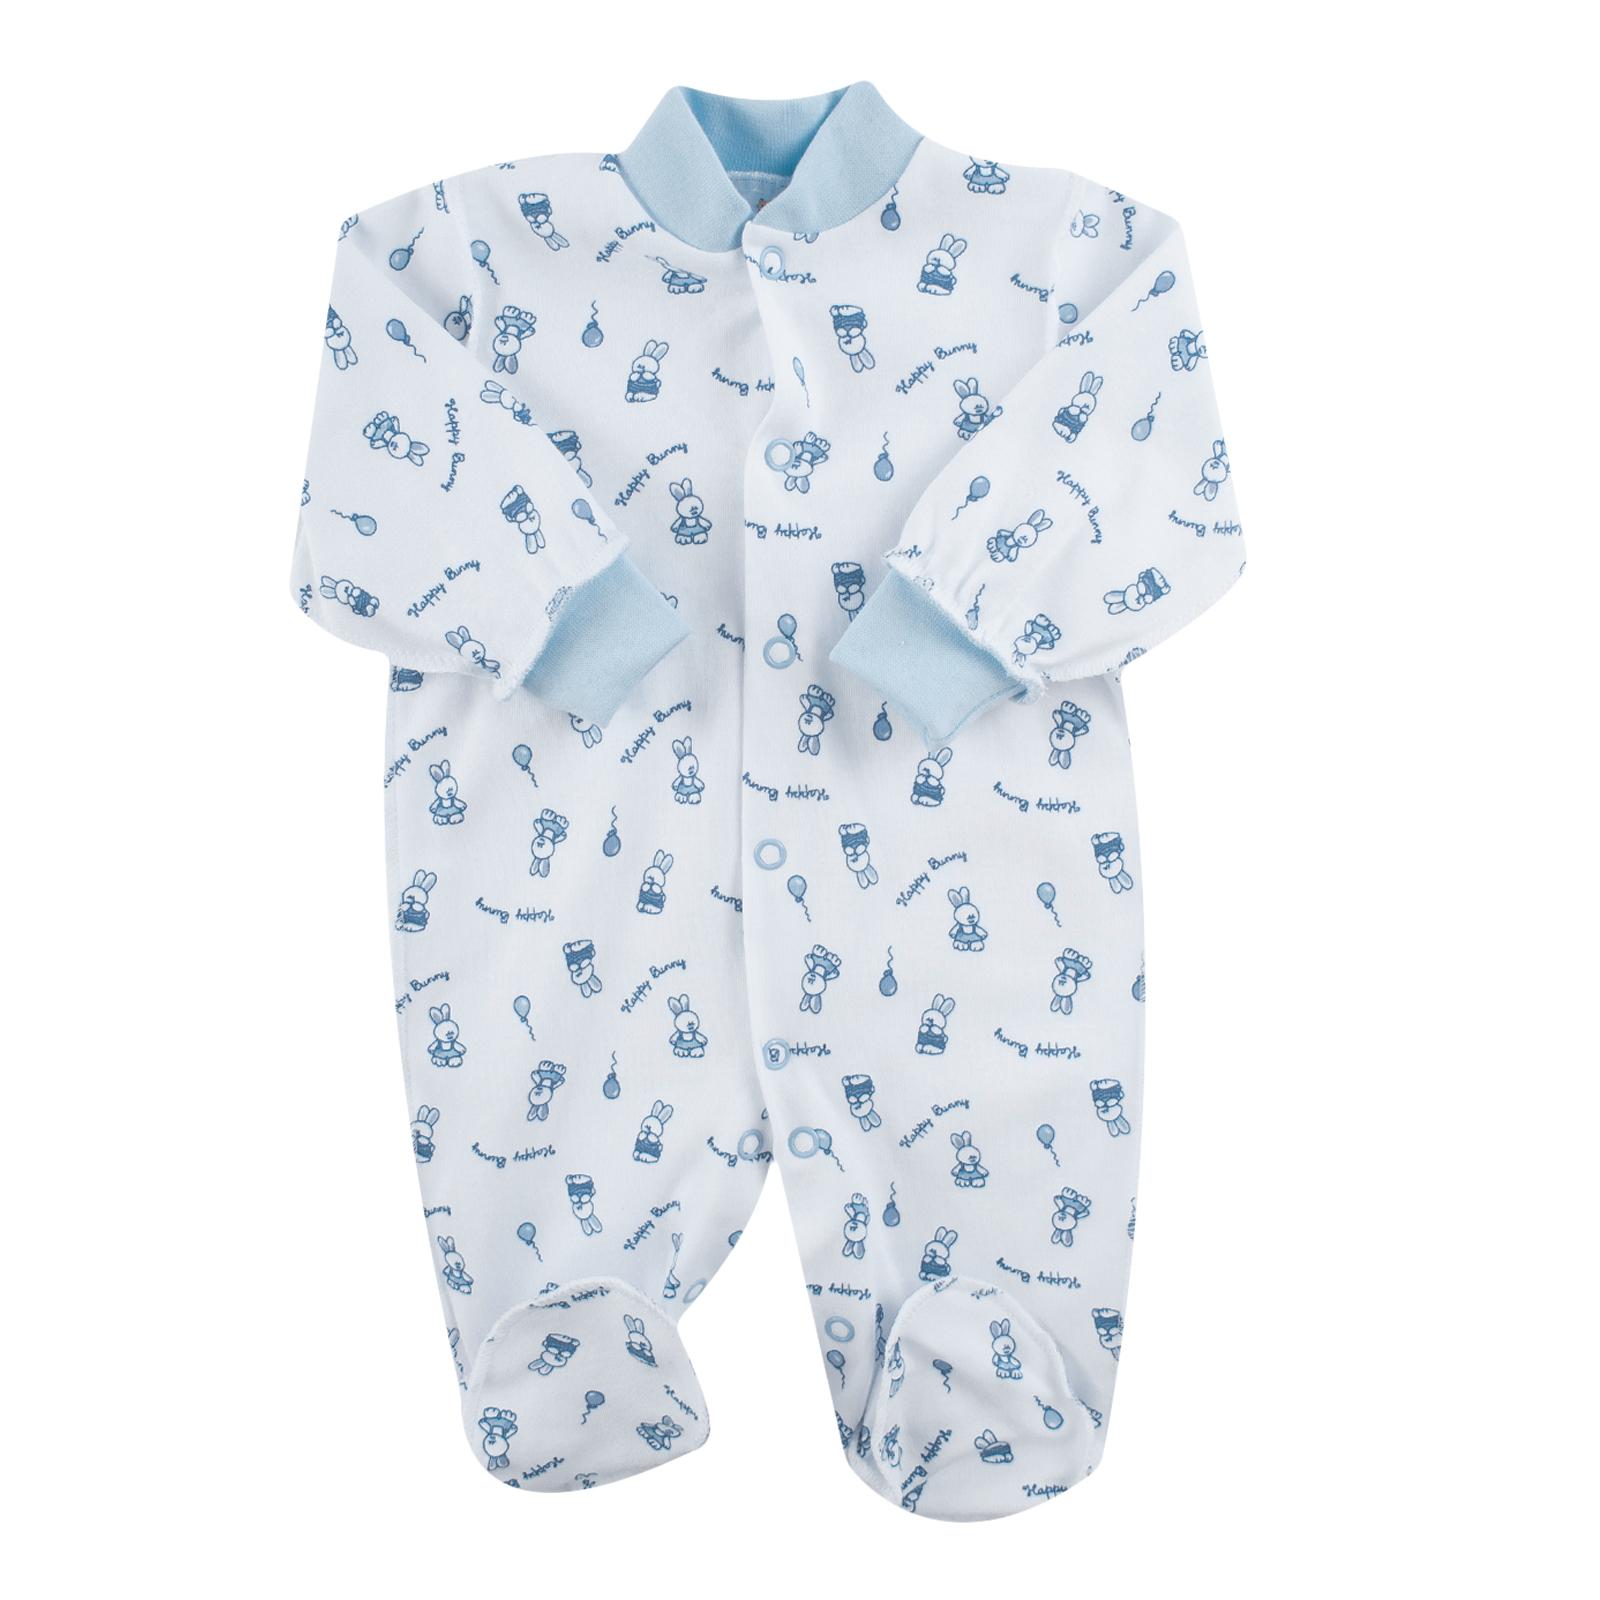 Комбинезон КОТМАРКОТ для мальчика, цвет набивка голубой тон 9-12 мес (размер 80)<br>